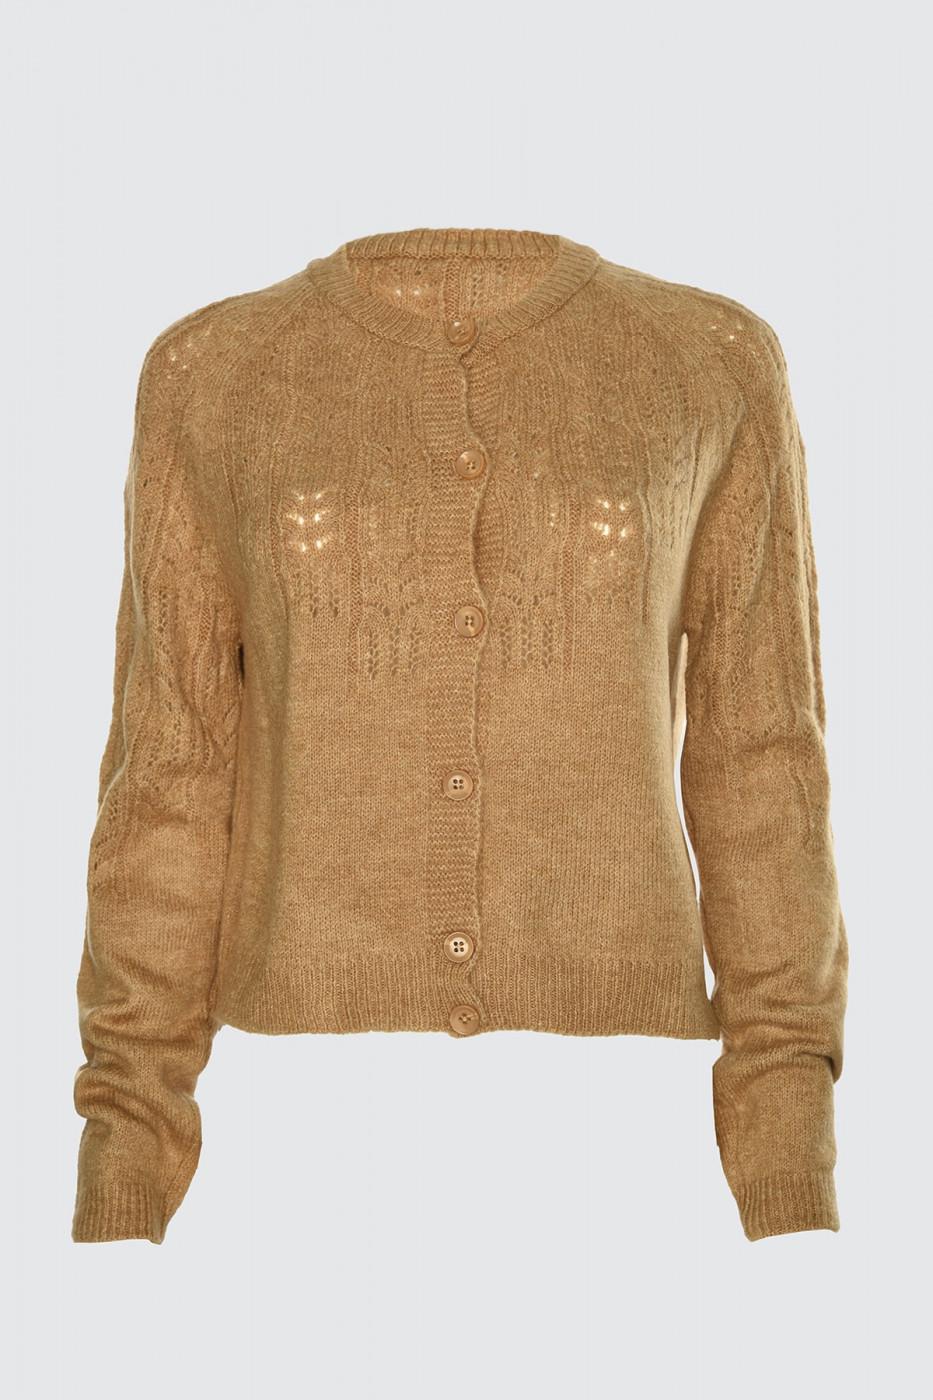 Trendyol Camel BlindkEd Knit Cardigan